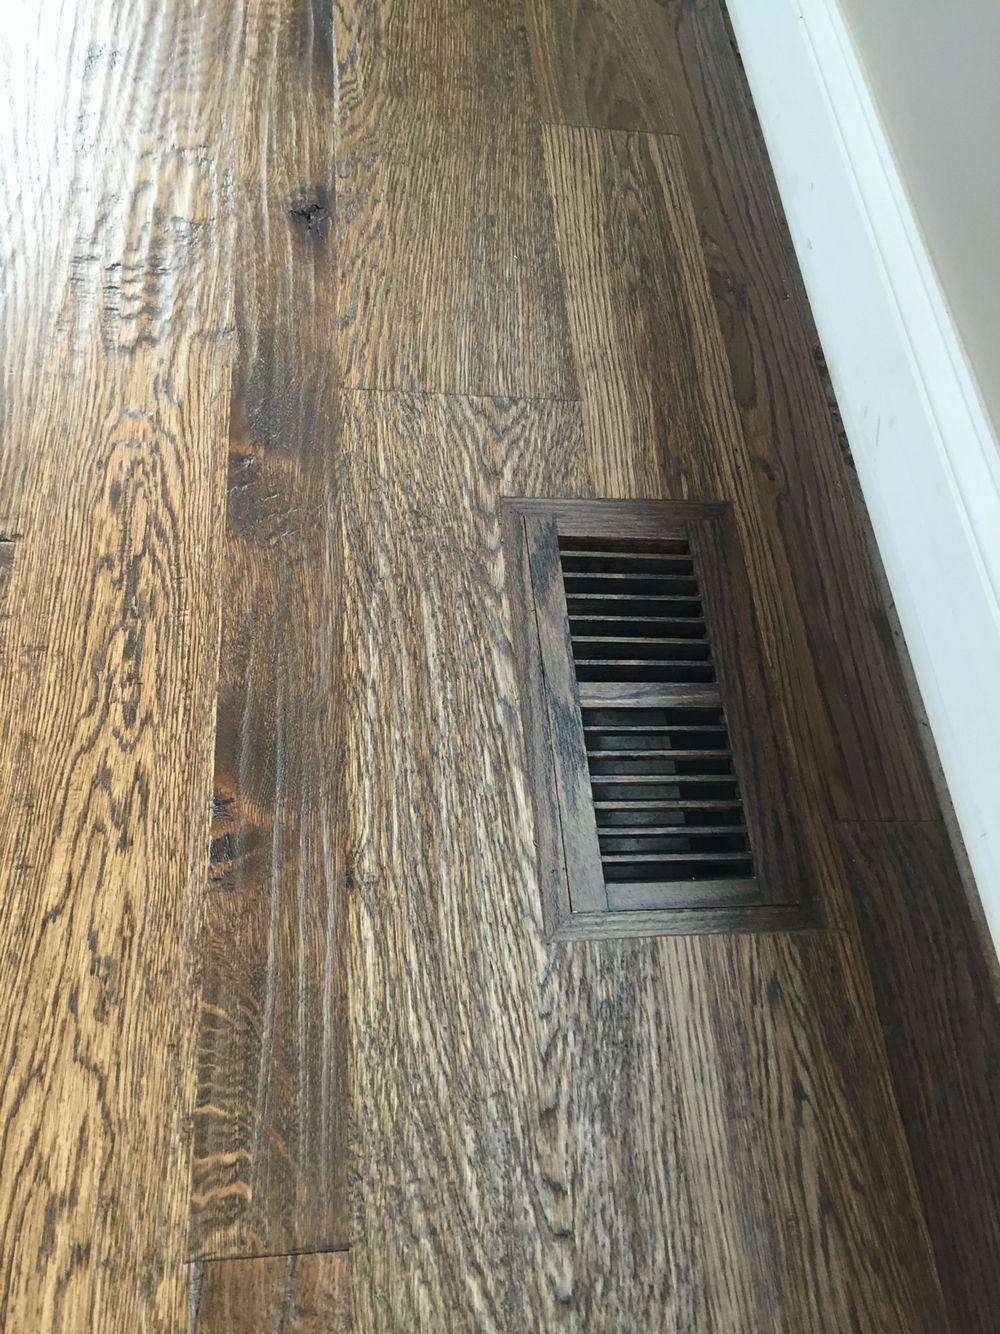 Locally Milled Random Width Nr White Oak Hand Scraped On Site - Mate flex flooring